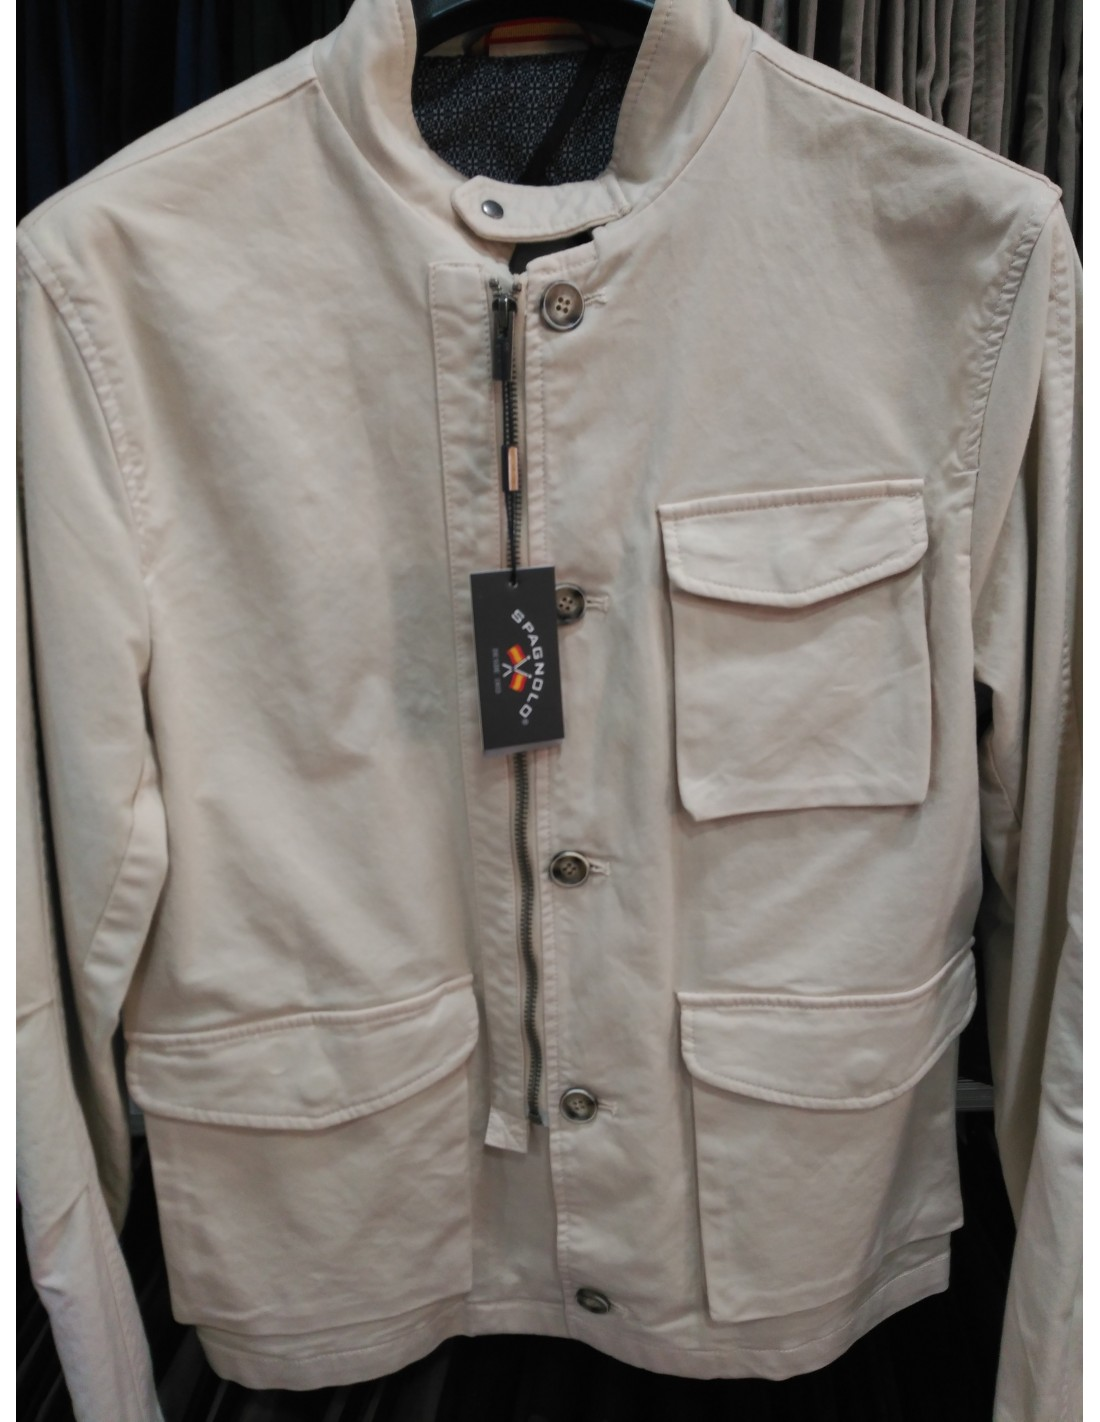 de8d80bf87f PARKA CANVAS SPAGNOLO - Montti Classic Wear - Tienda Online de ropa